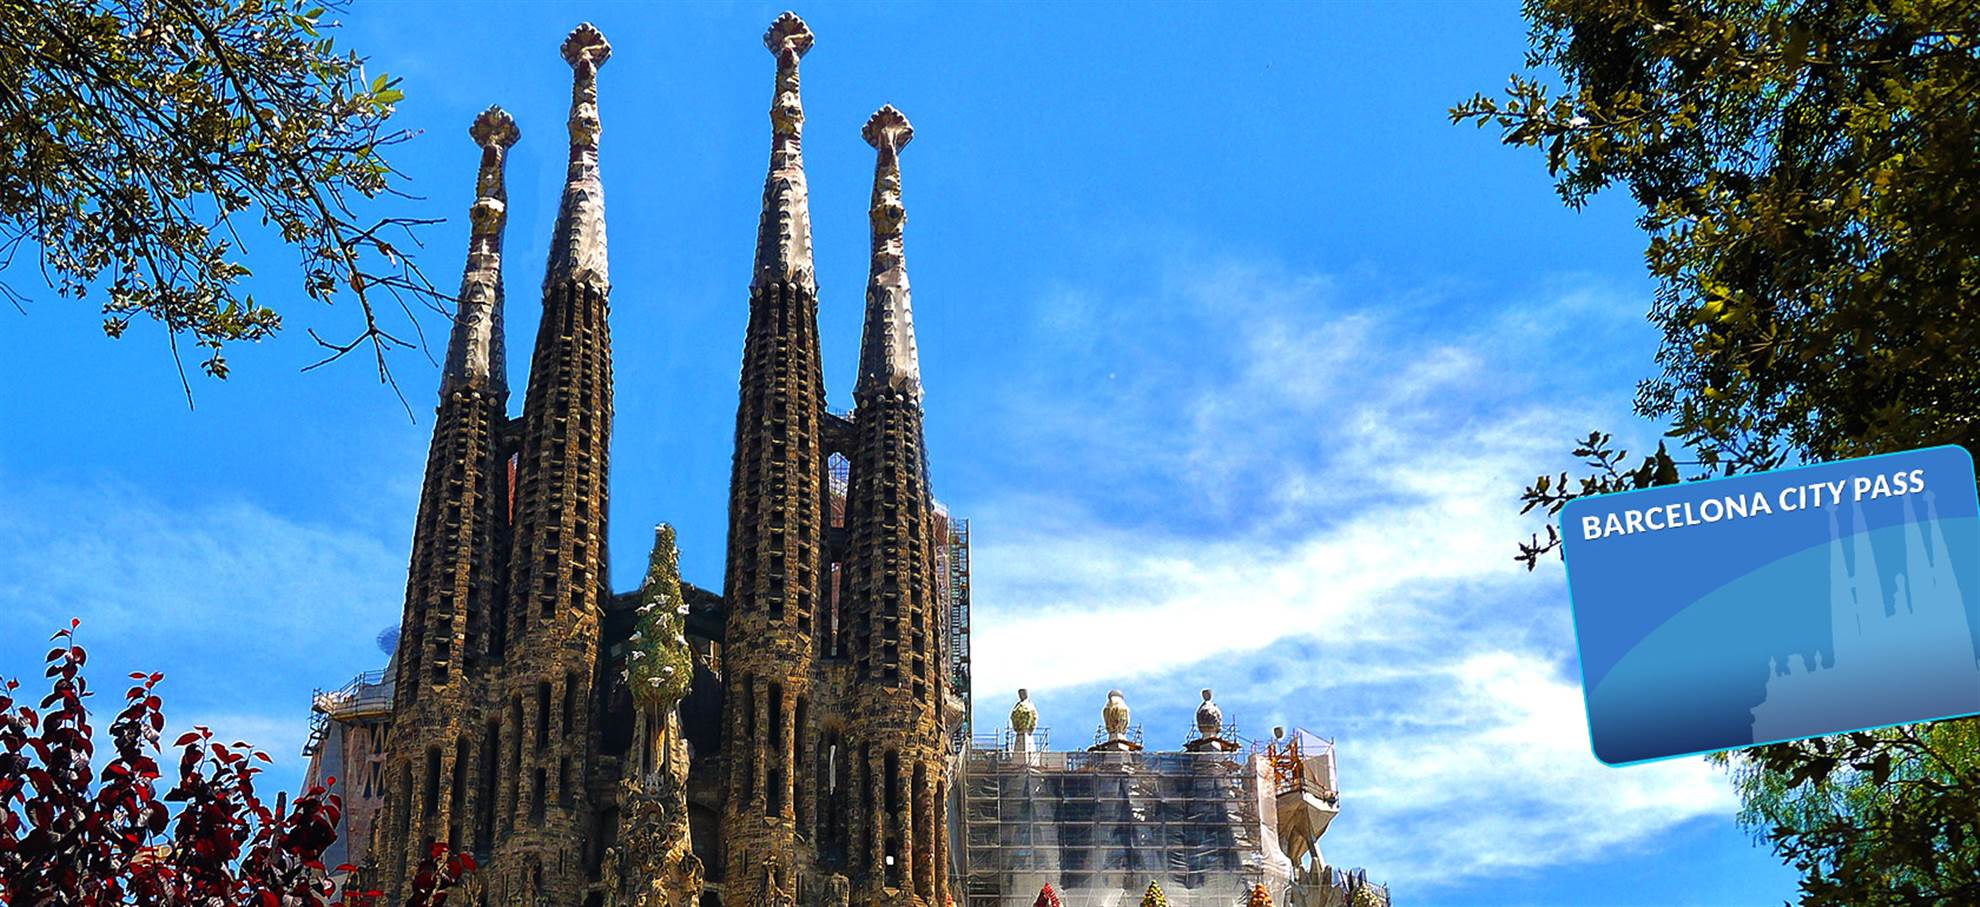 Barcelona City Pass (Incl. Sagrada Familia Tour in English and Park Güell)